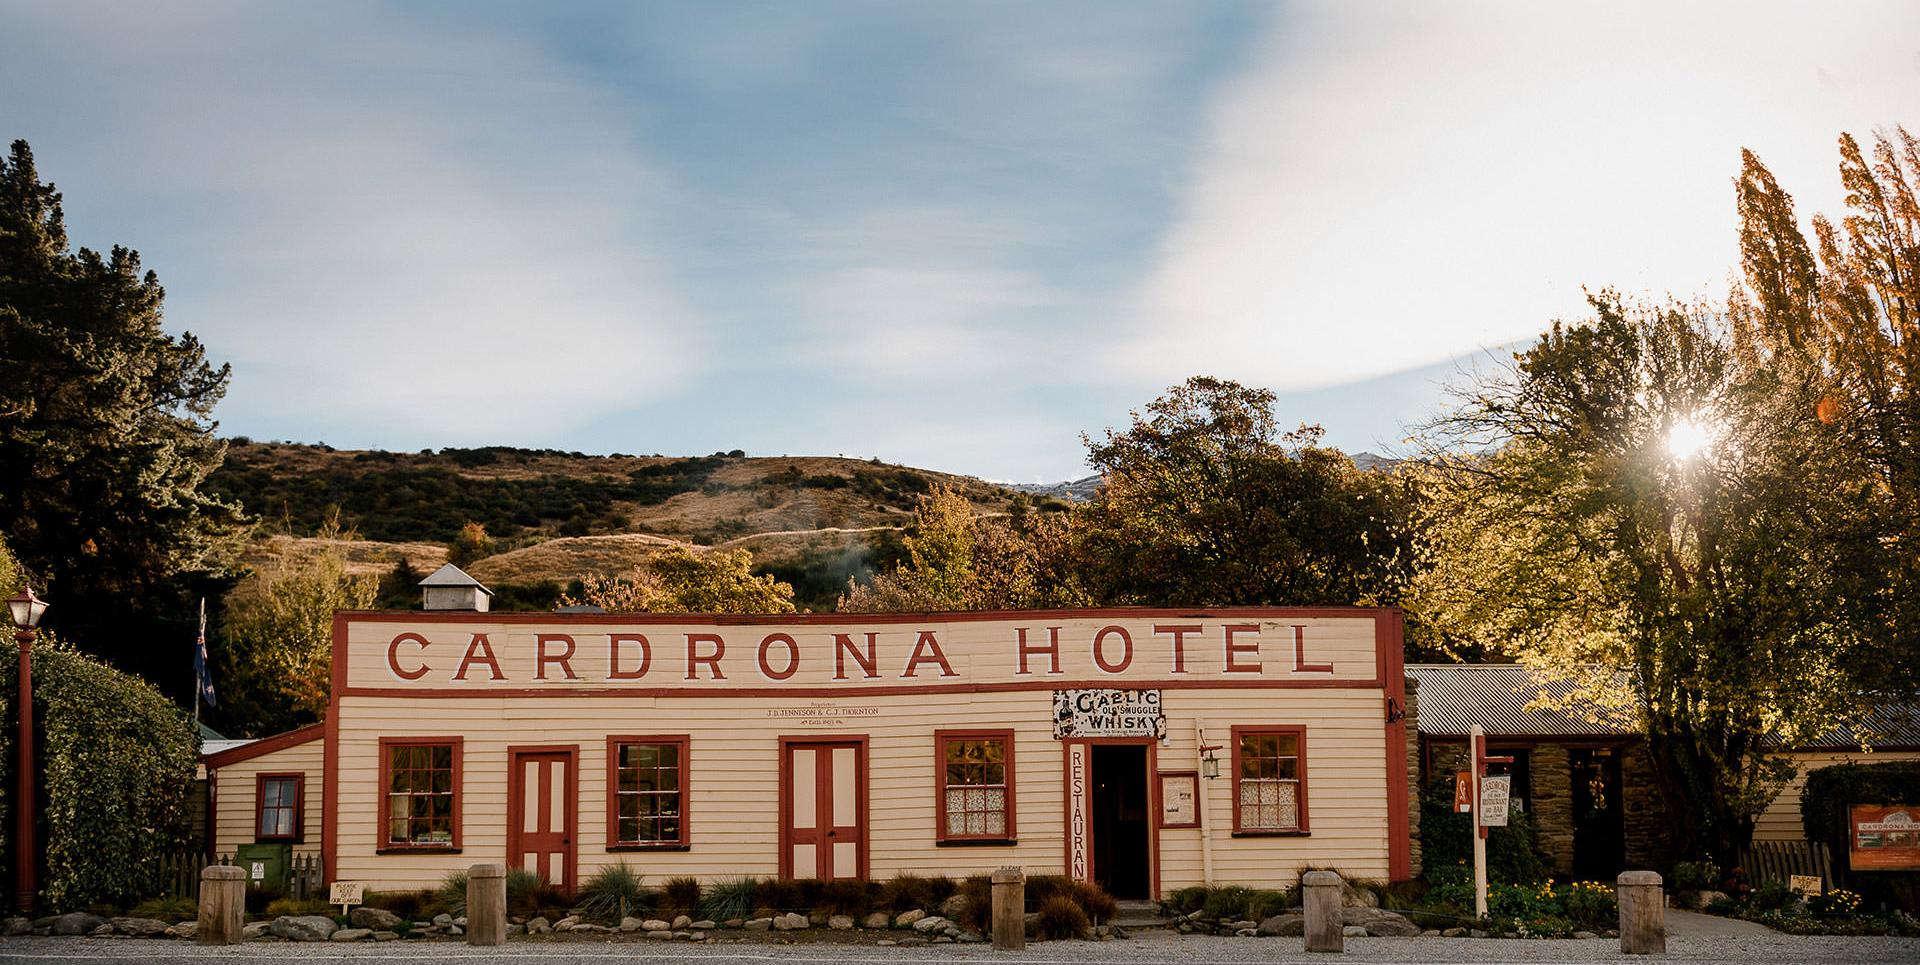 @Cardrona Hotel